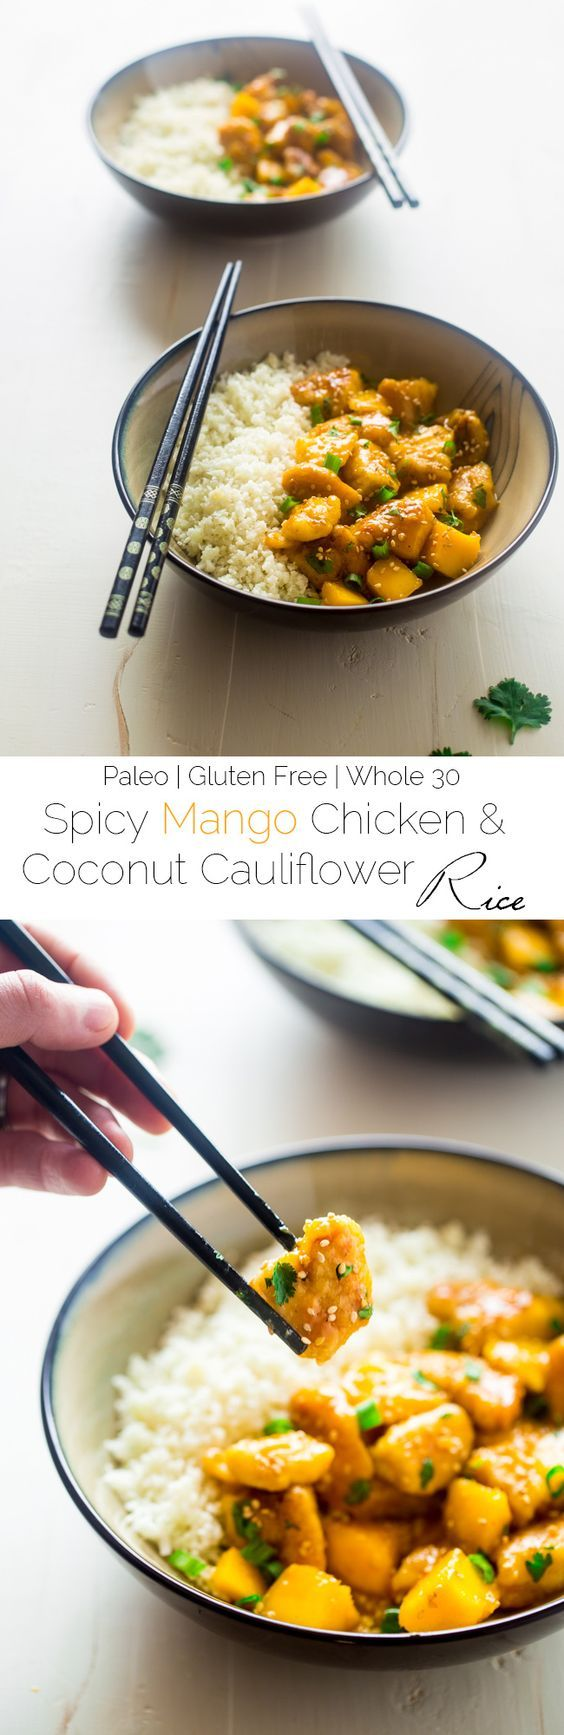 Mango Chicken With Coconut Cauliflower Rice {Whole 30 + Paleo + High Protein} #justeatrealfood #foodfaithfitness